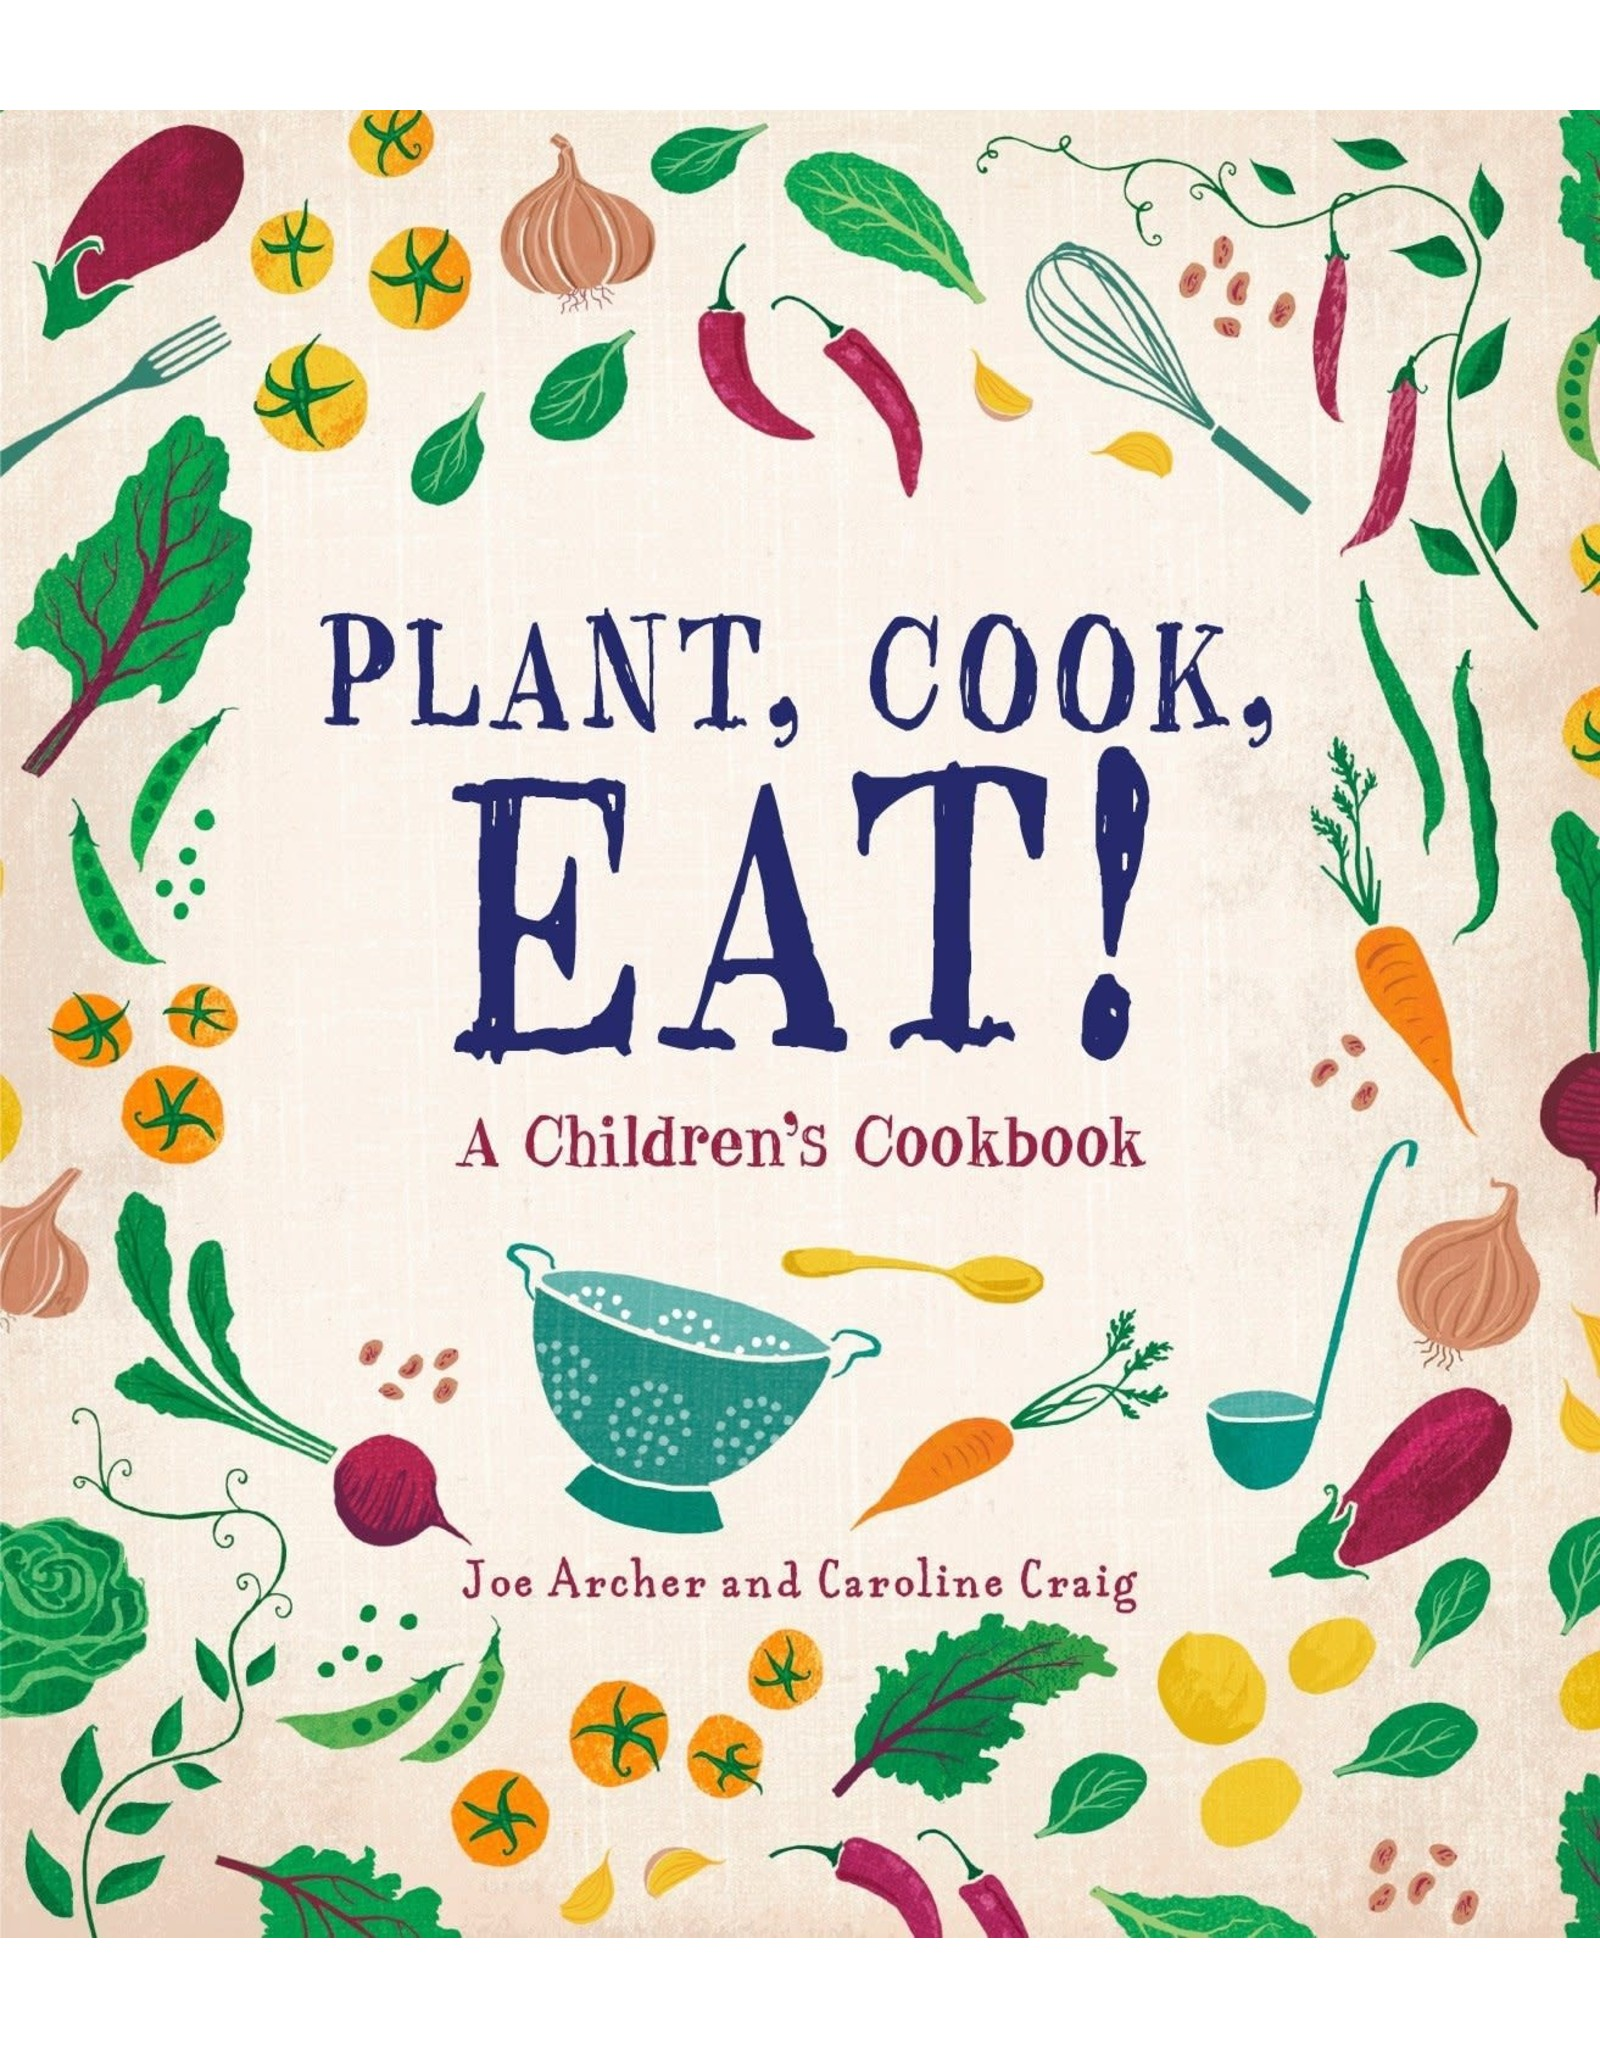 Ingram Plant, Cook, Eat! A Children's Cookbook